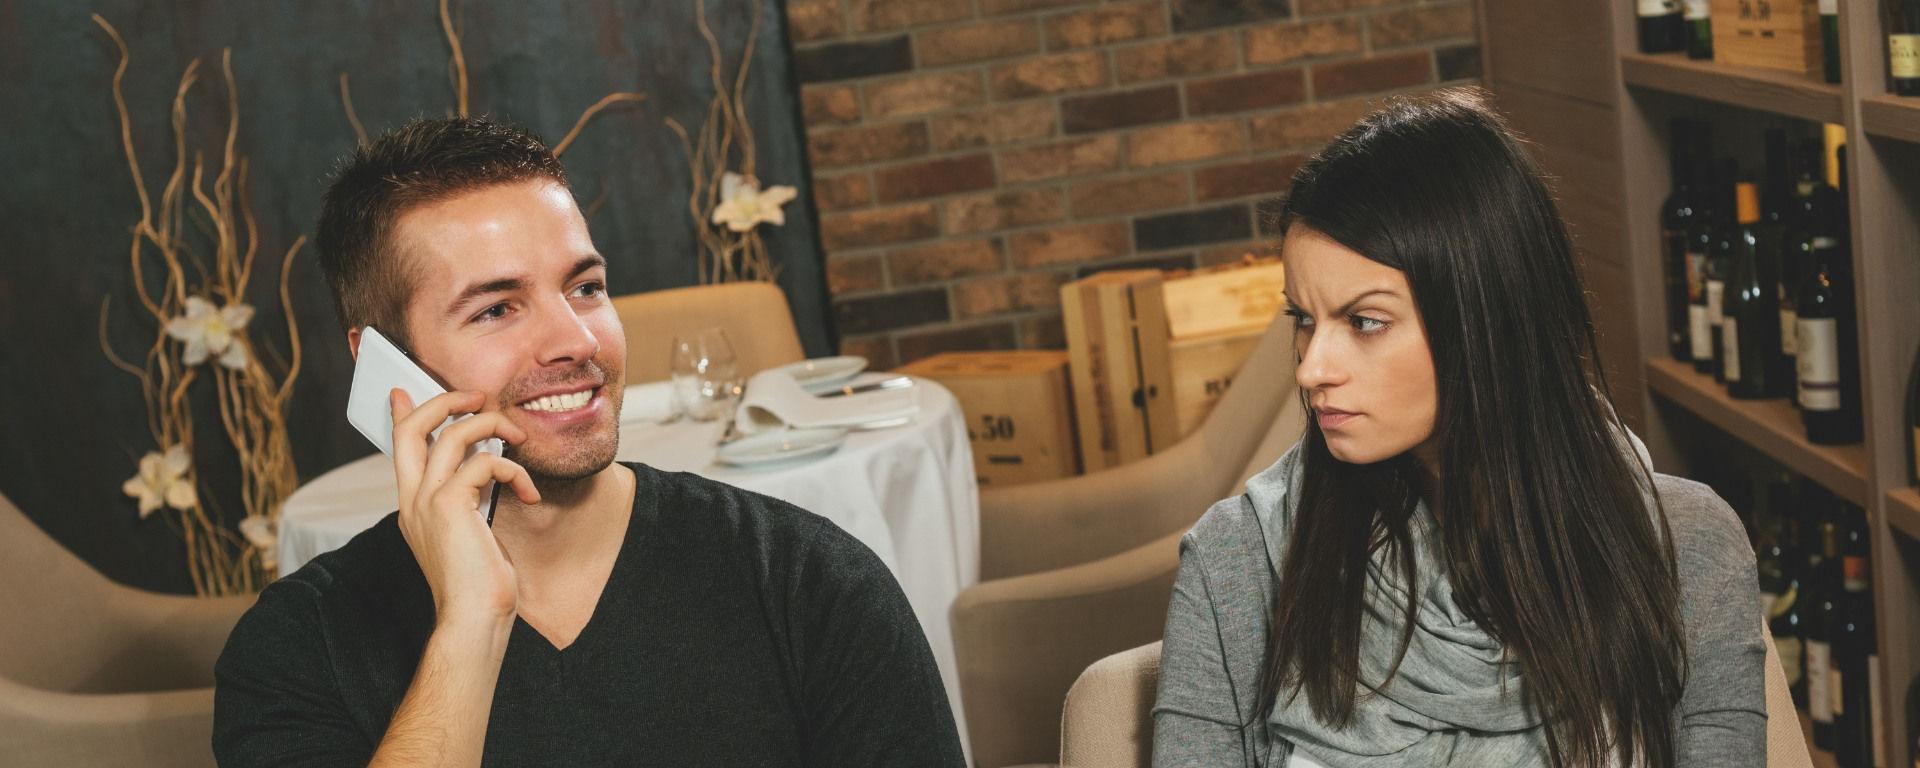 puhe dating